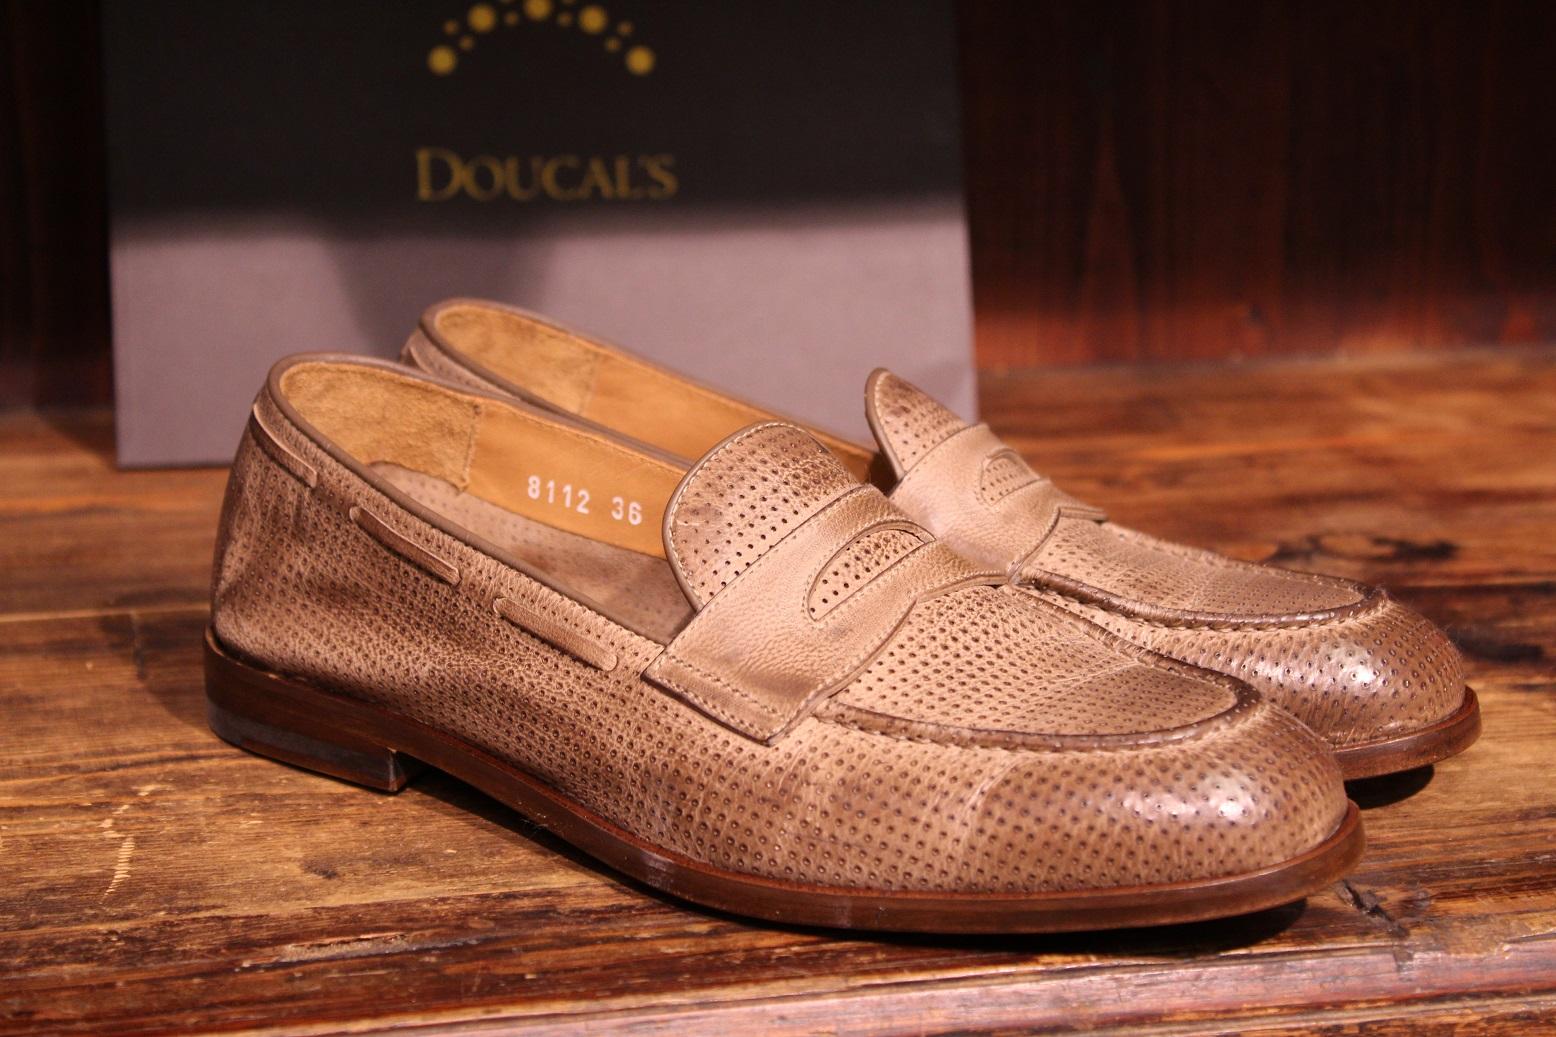 gallery_1_anglijskaja-jelegantnost-i-italjanskij-komfort-jekskljuzivnoj-obuvi-doucals-5